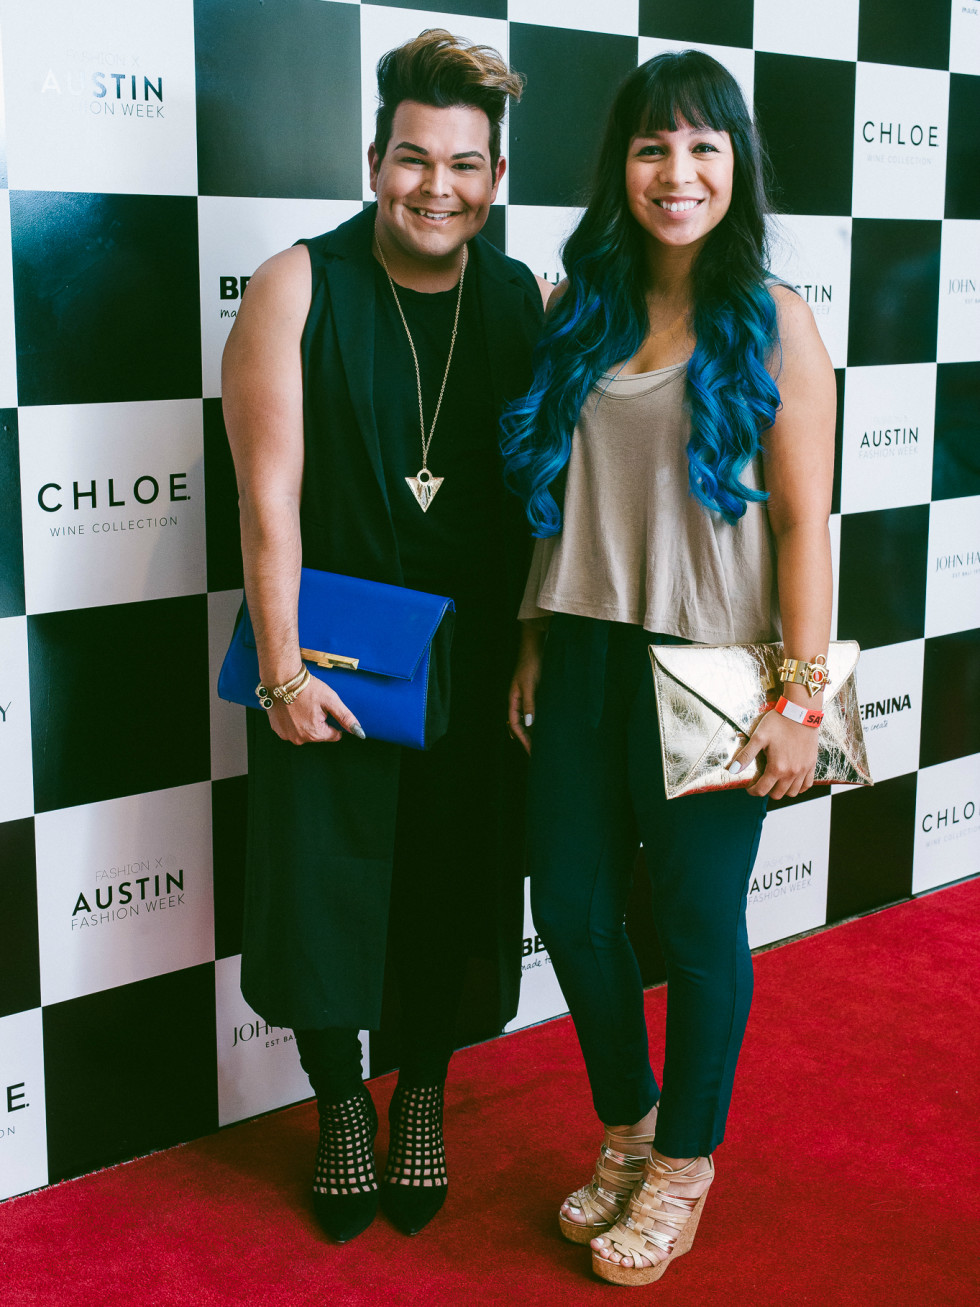 Austin Fashion Week 2016 red carpet Dominic Alonzo Samantha Plasencia